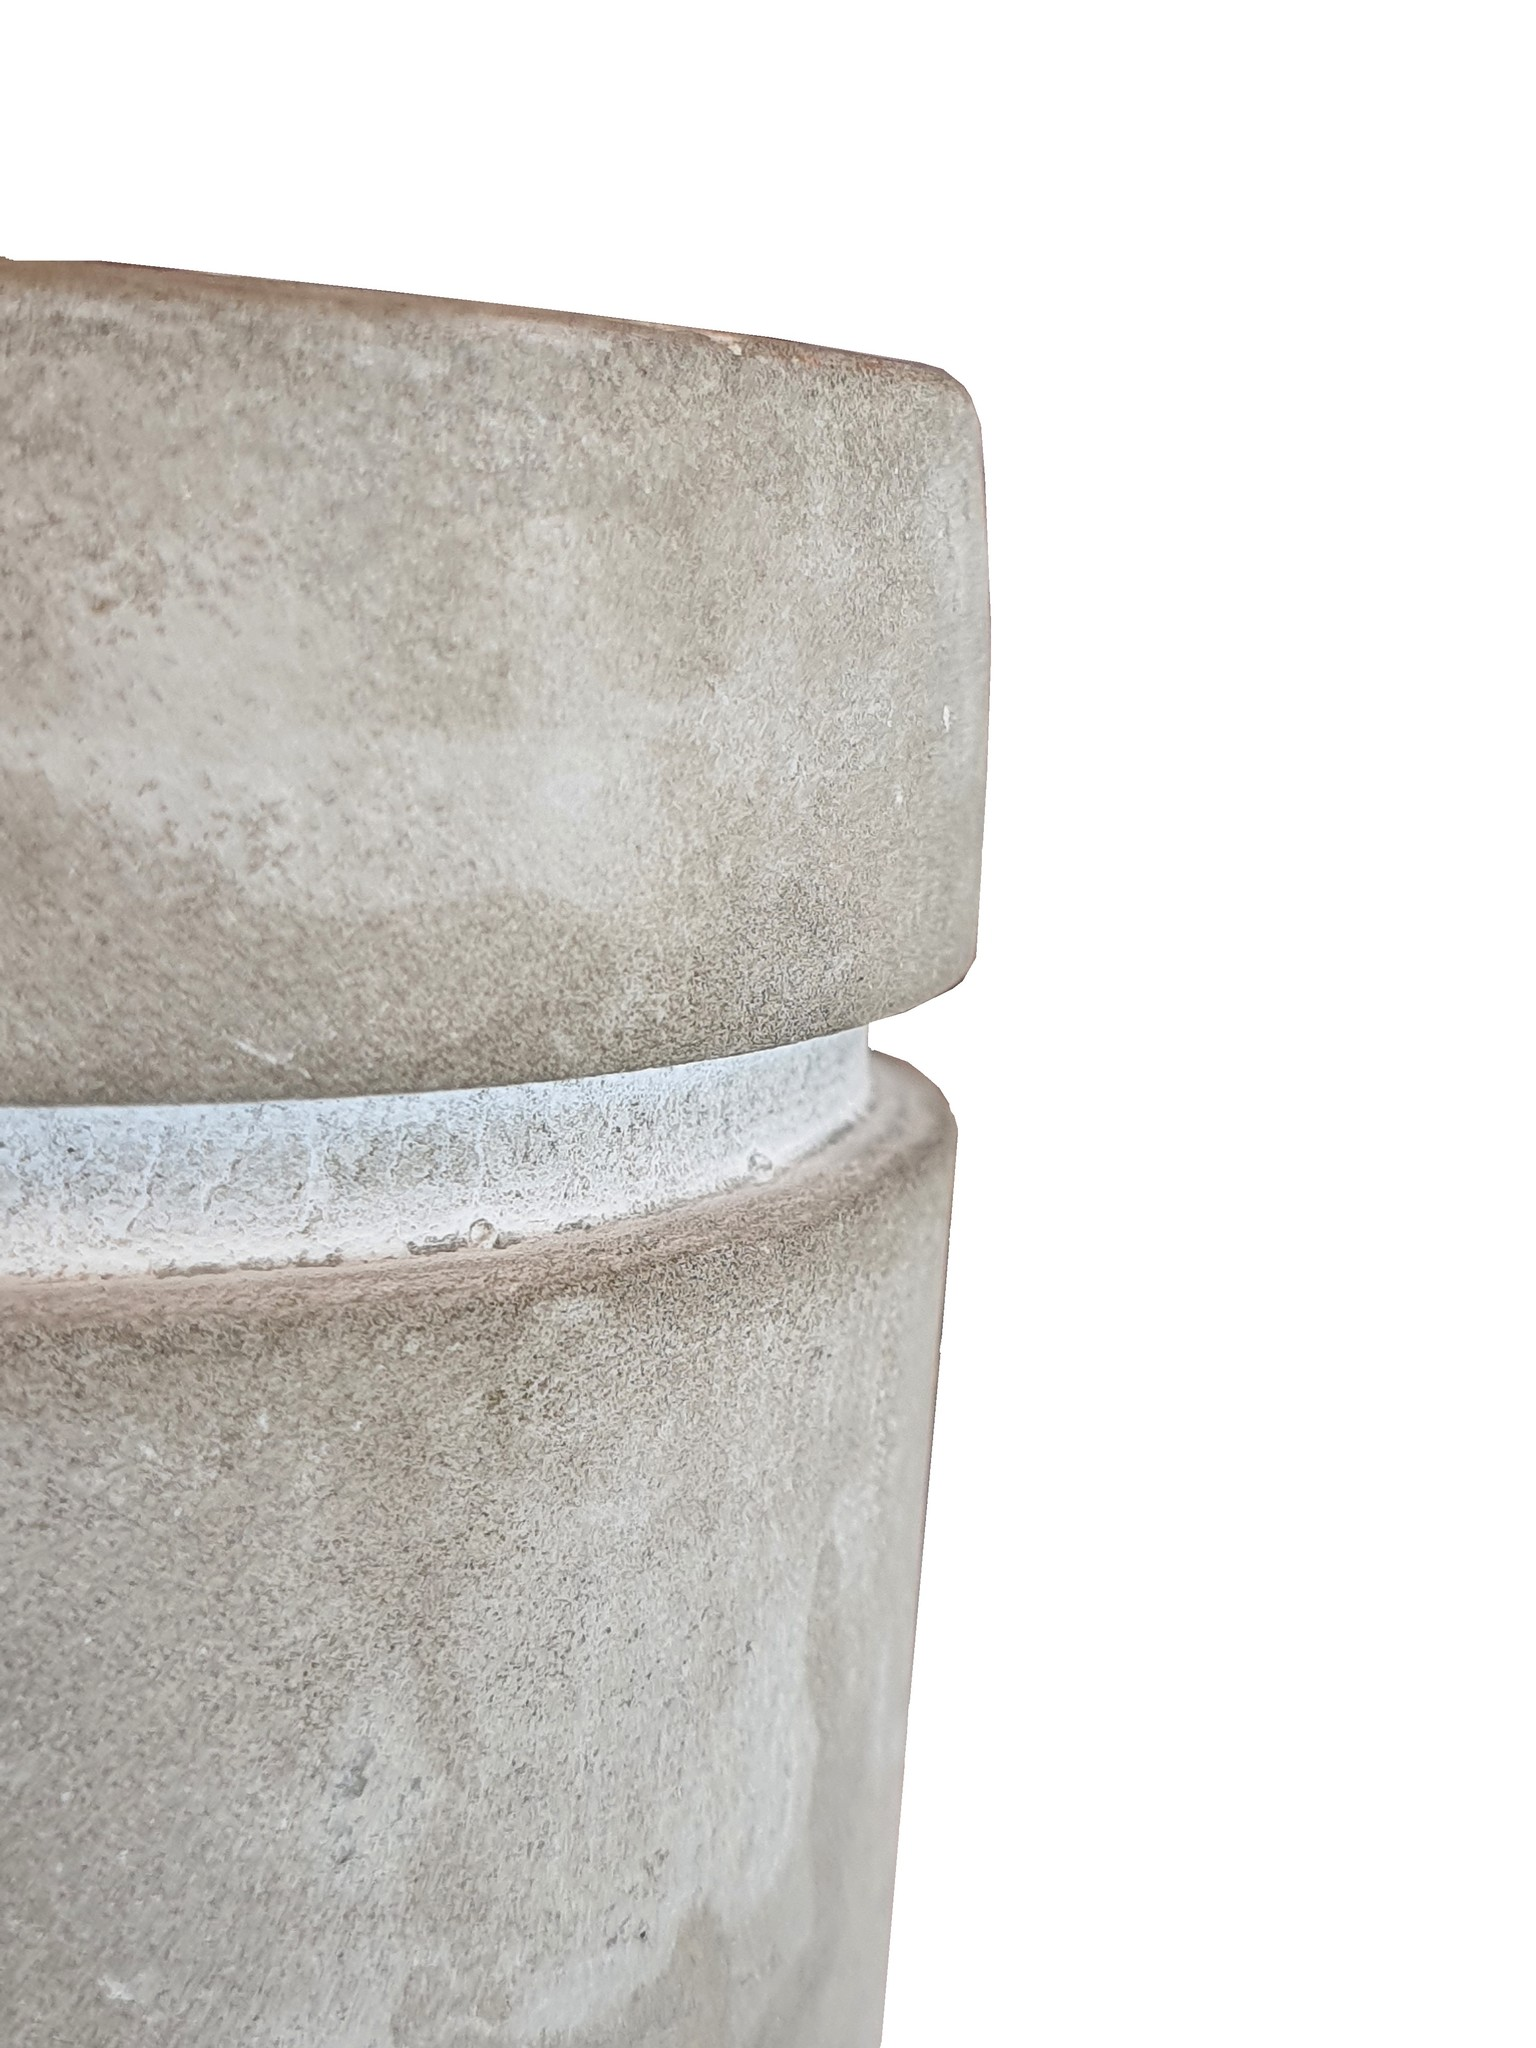 candle hold ceramic concrete gold assort 3-3